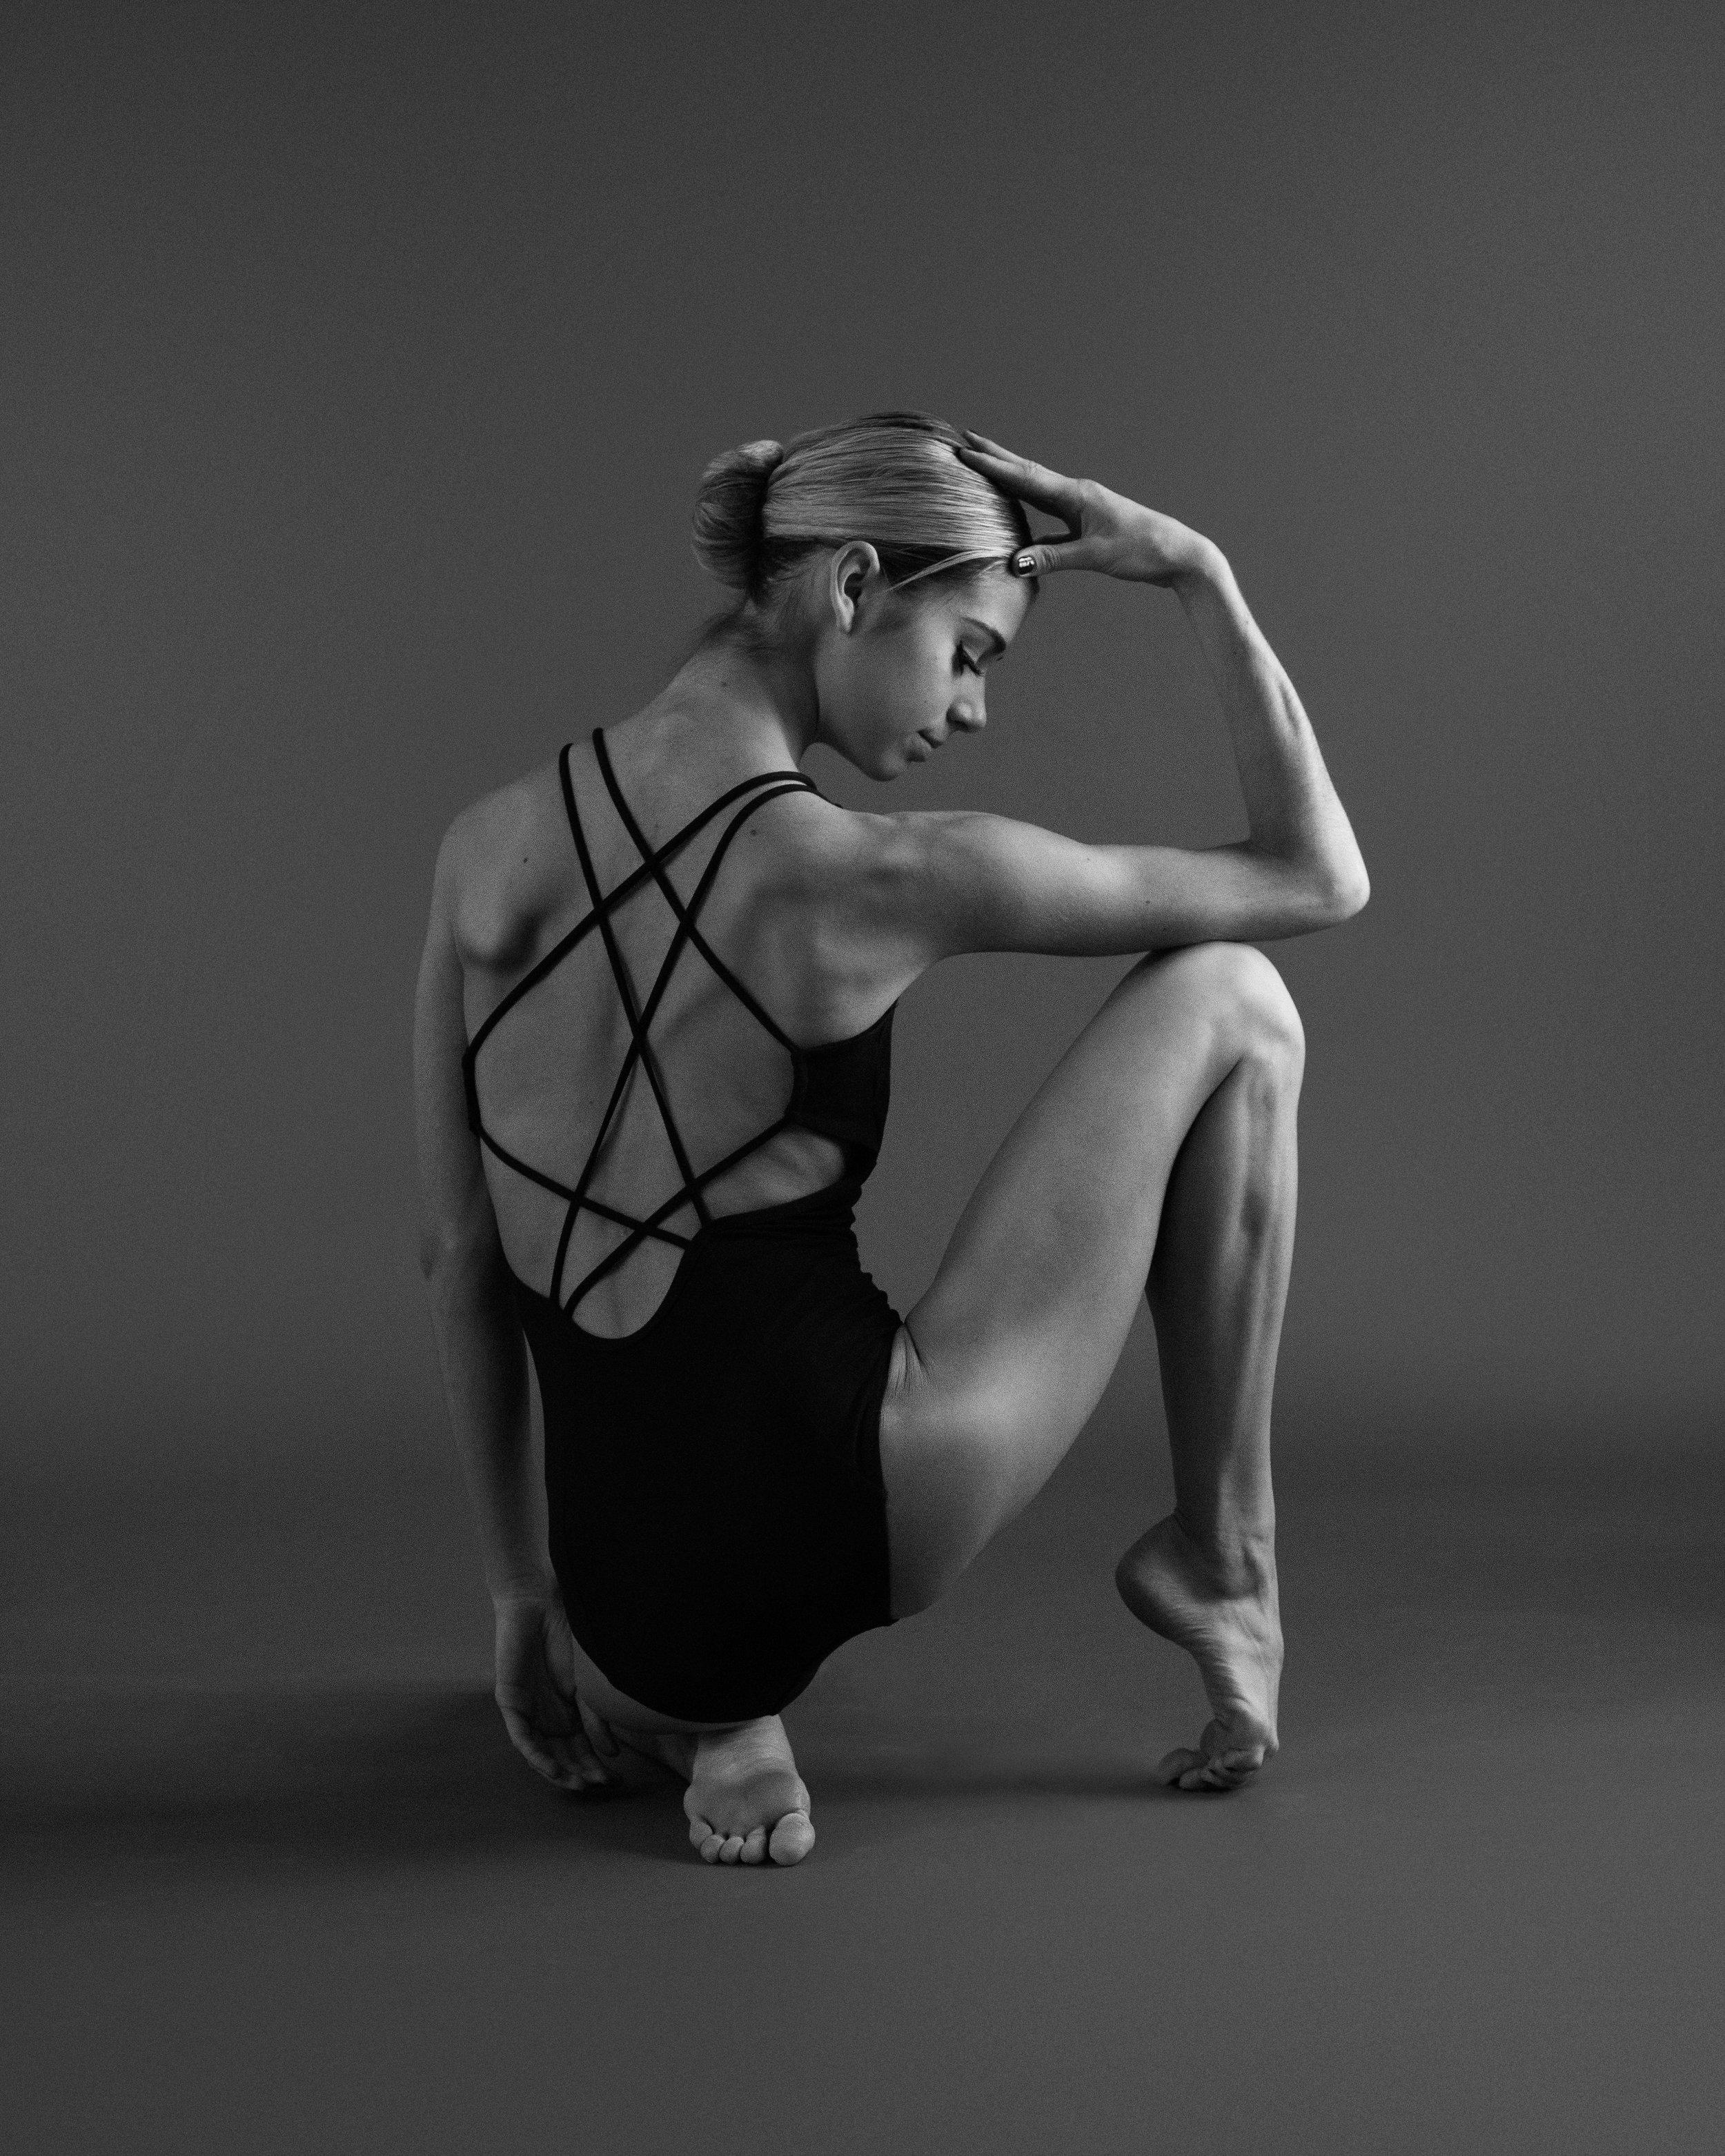 Black and White Dance Portrait